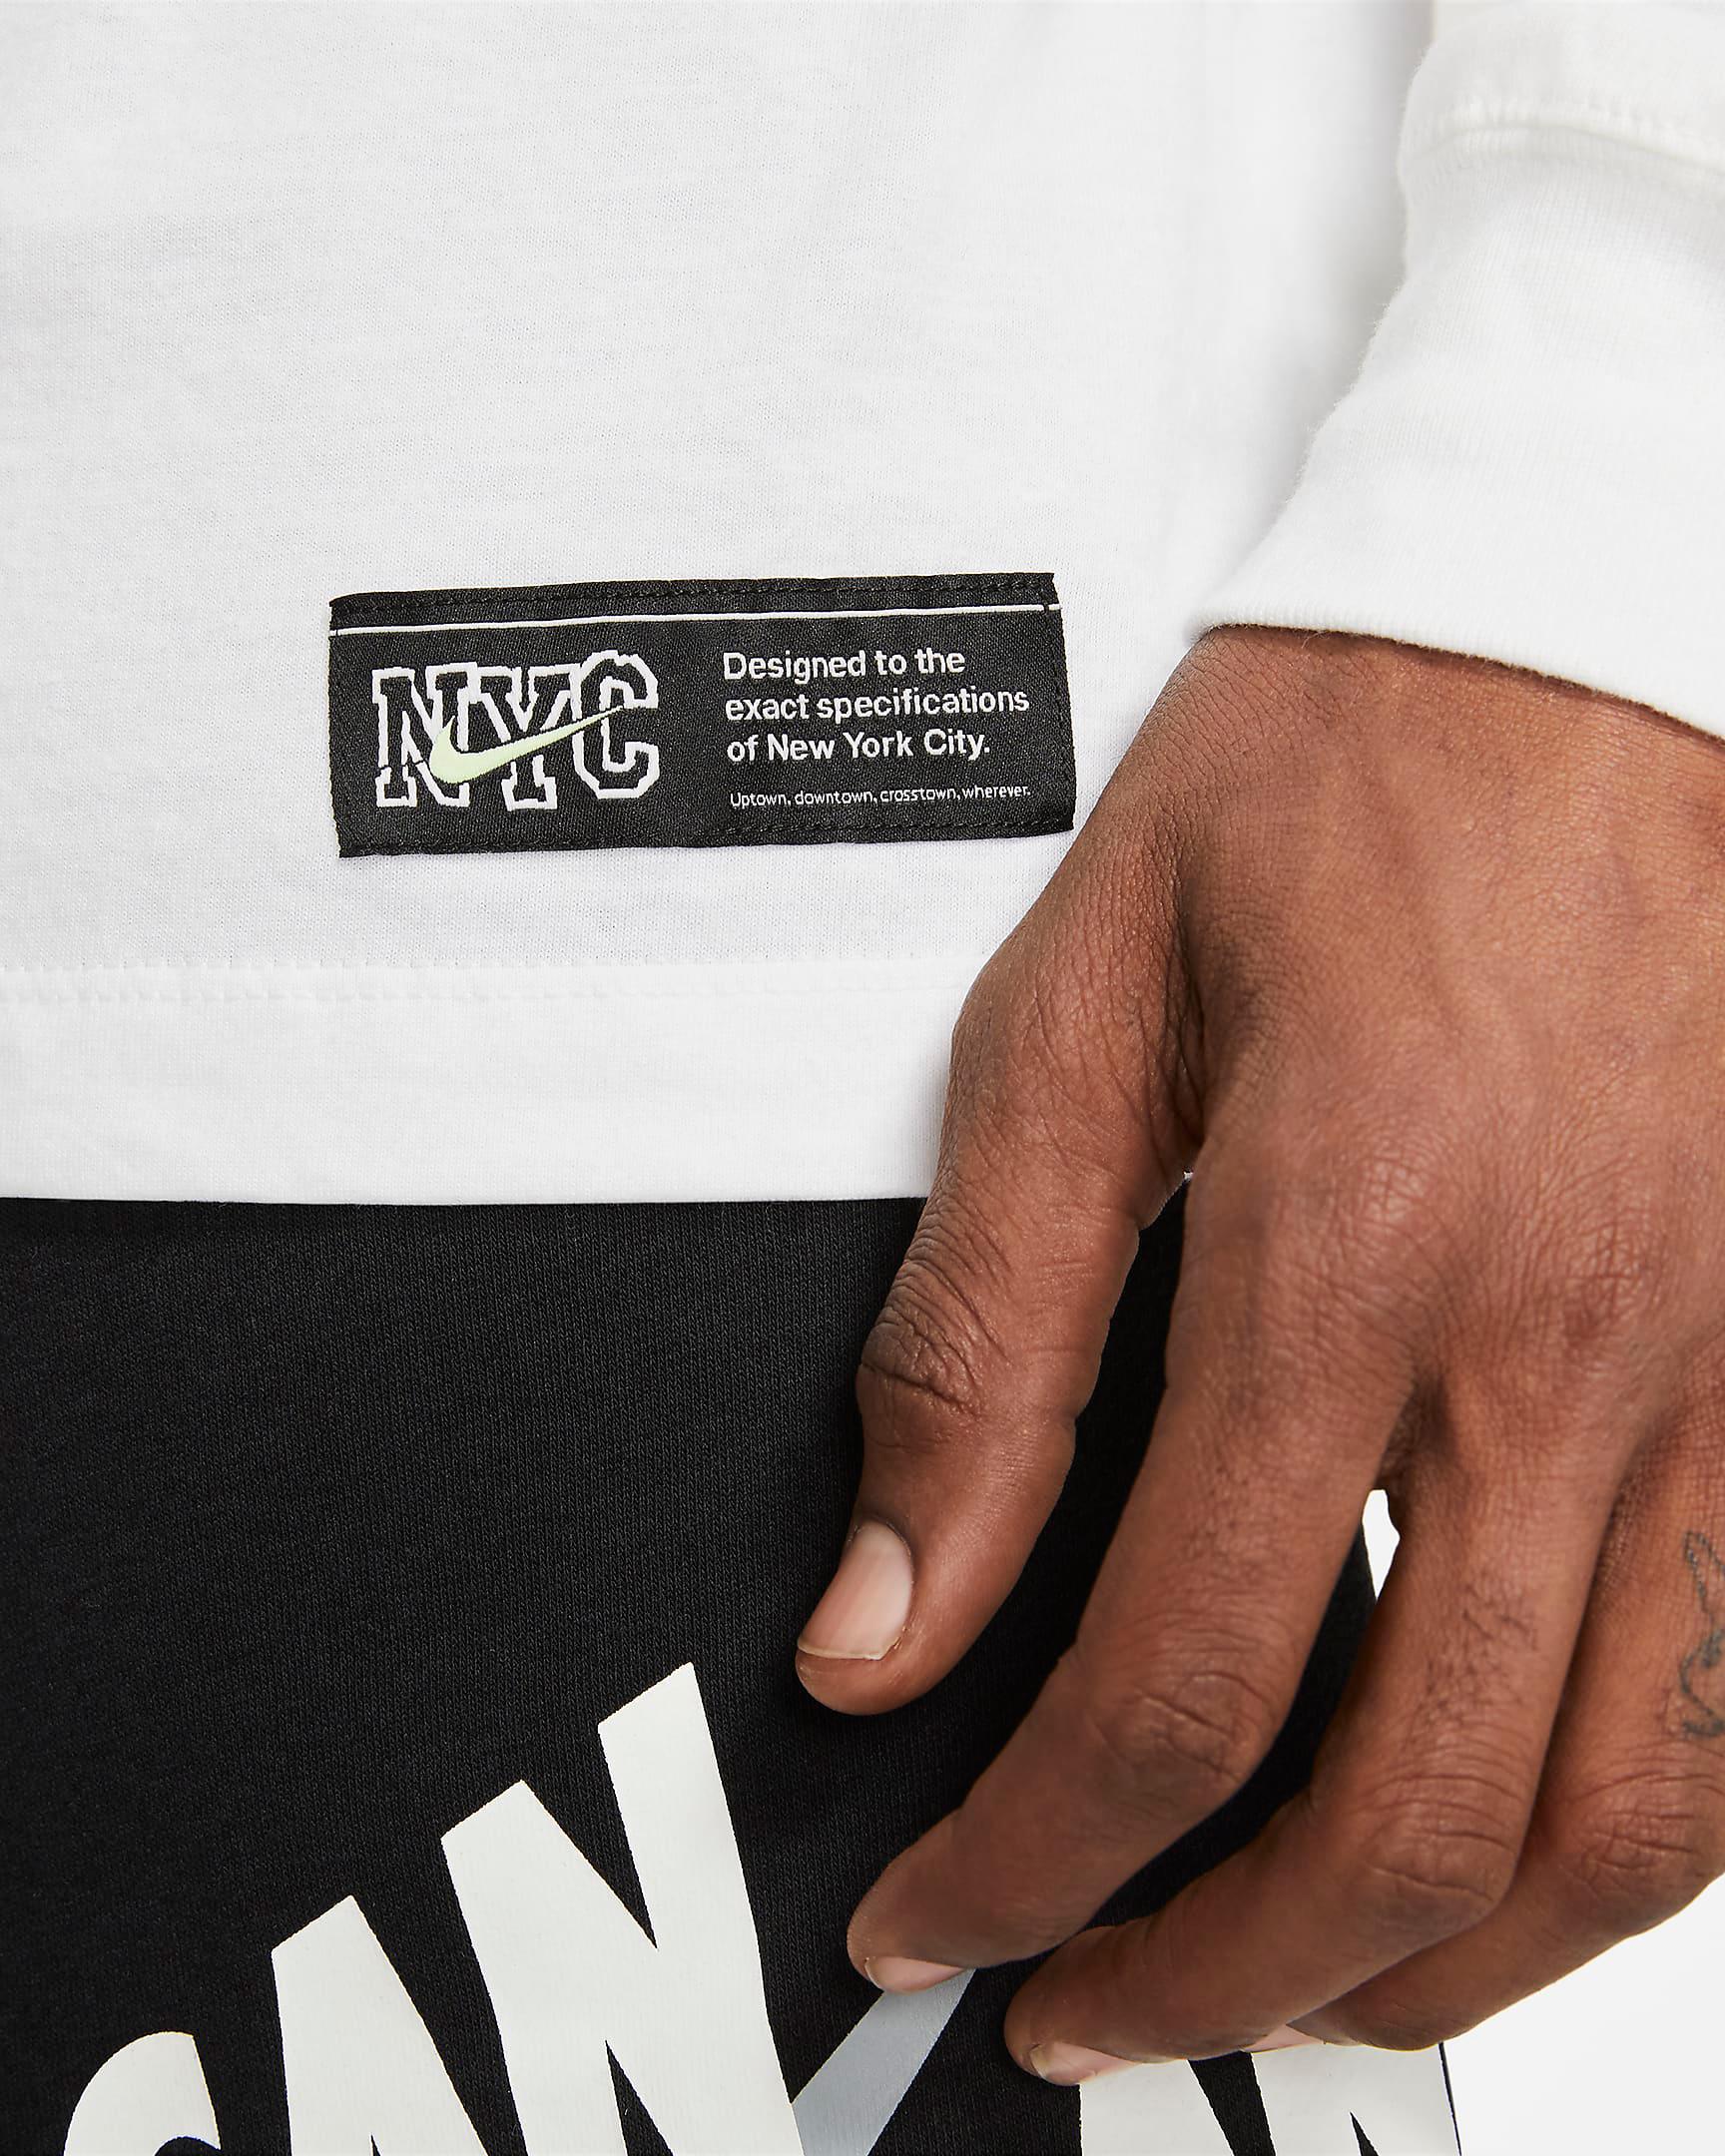 nike-sportswear-nyc-big-apple-shirt-3